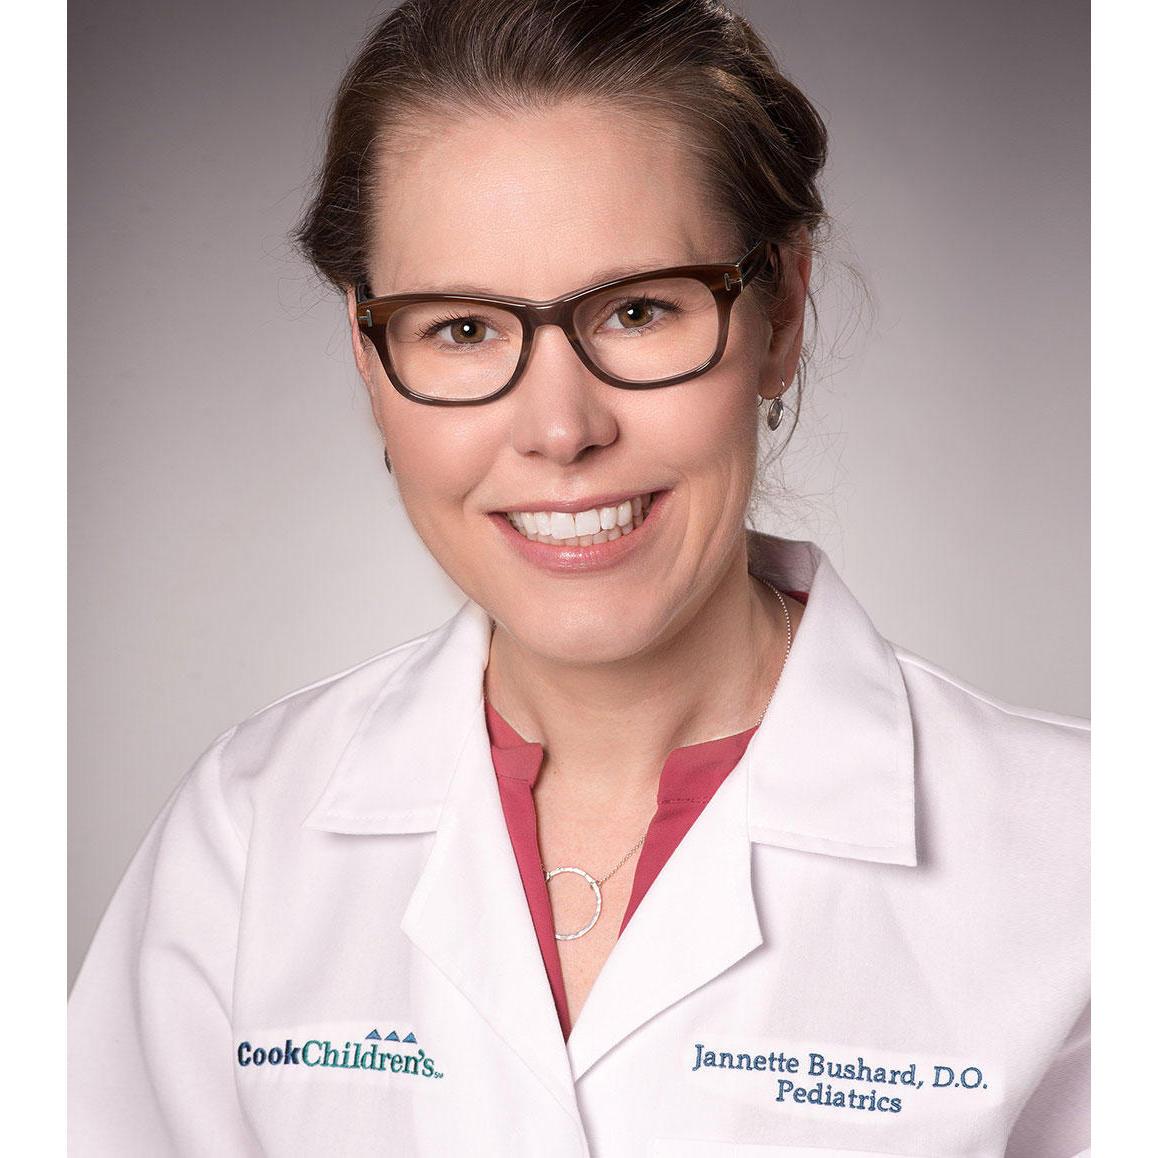 Jannette Bushard MD